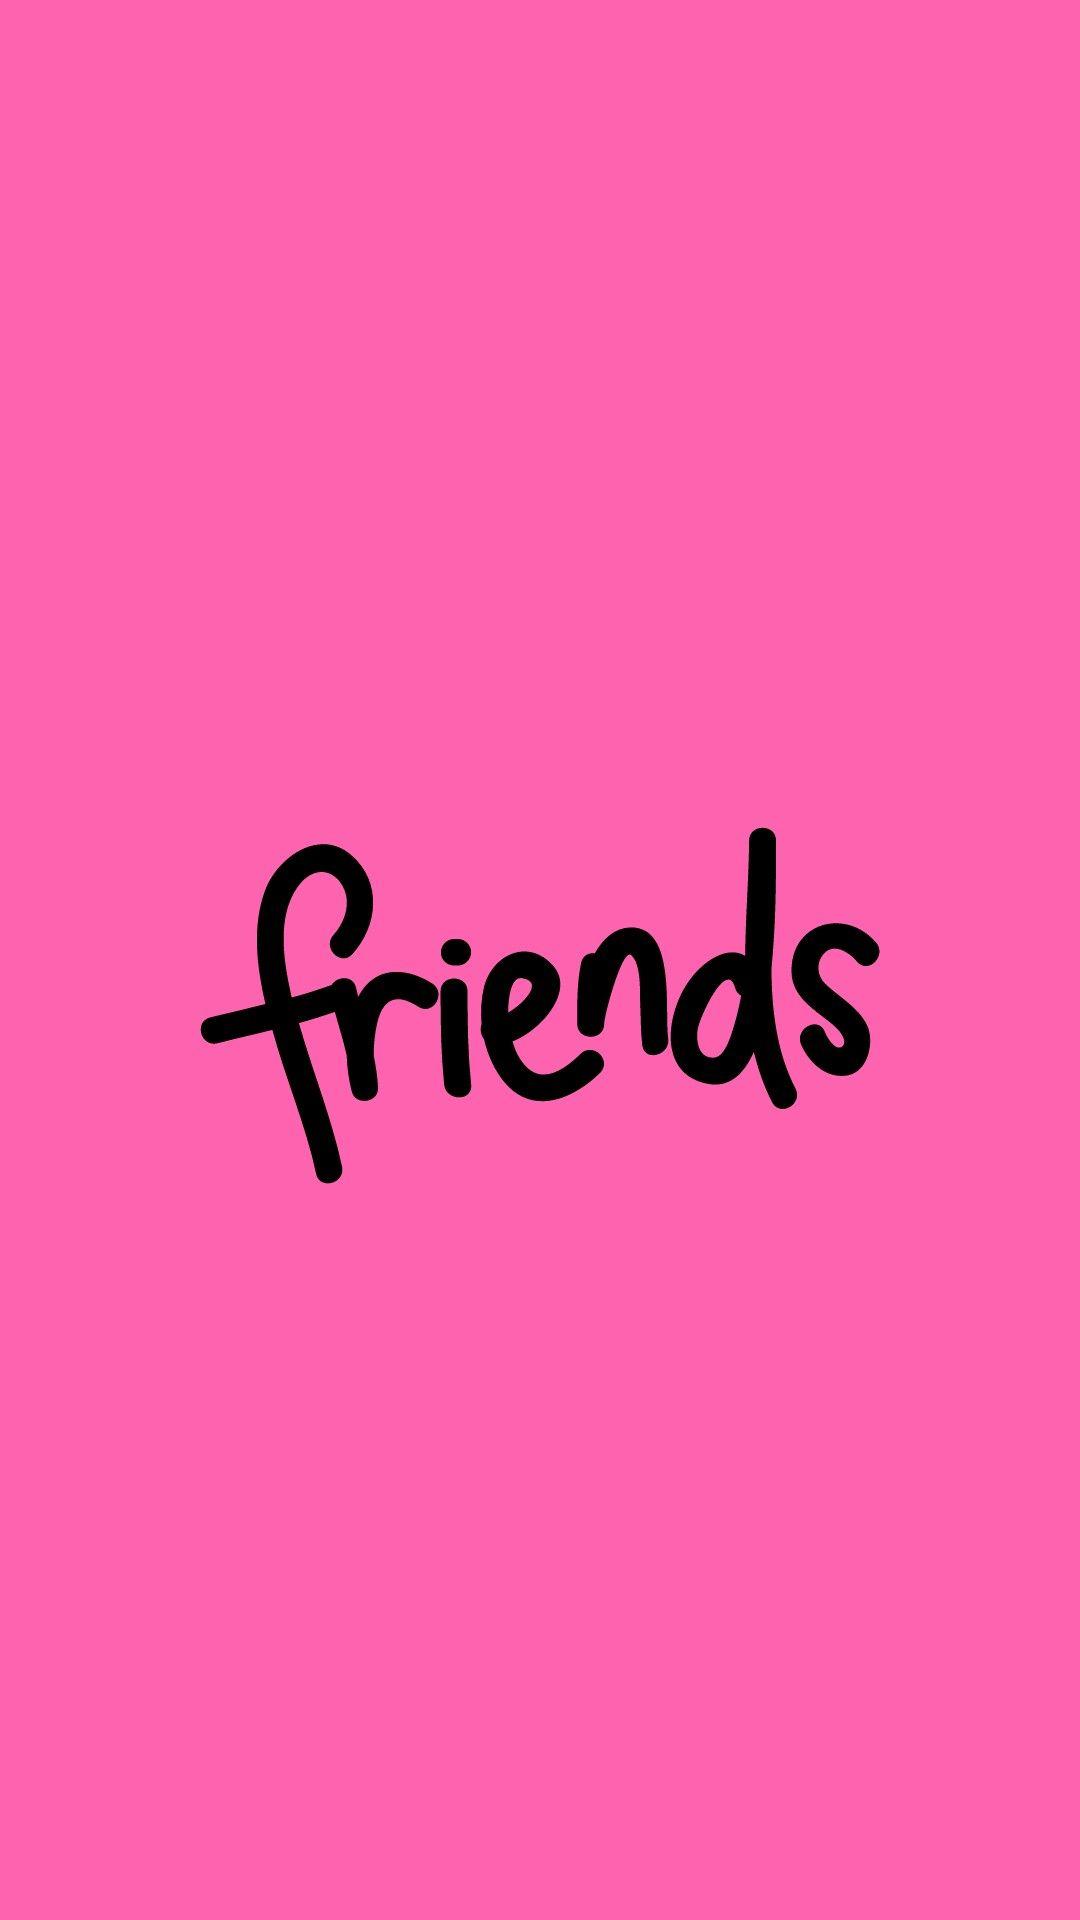 No Siempre Es Friends Habeces Es Infriends Com Imagens Ideias